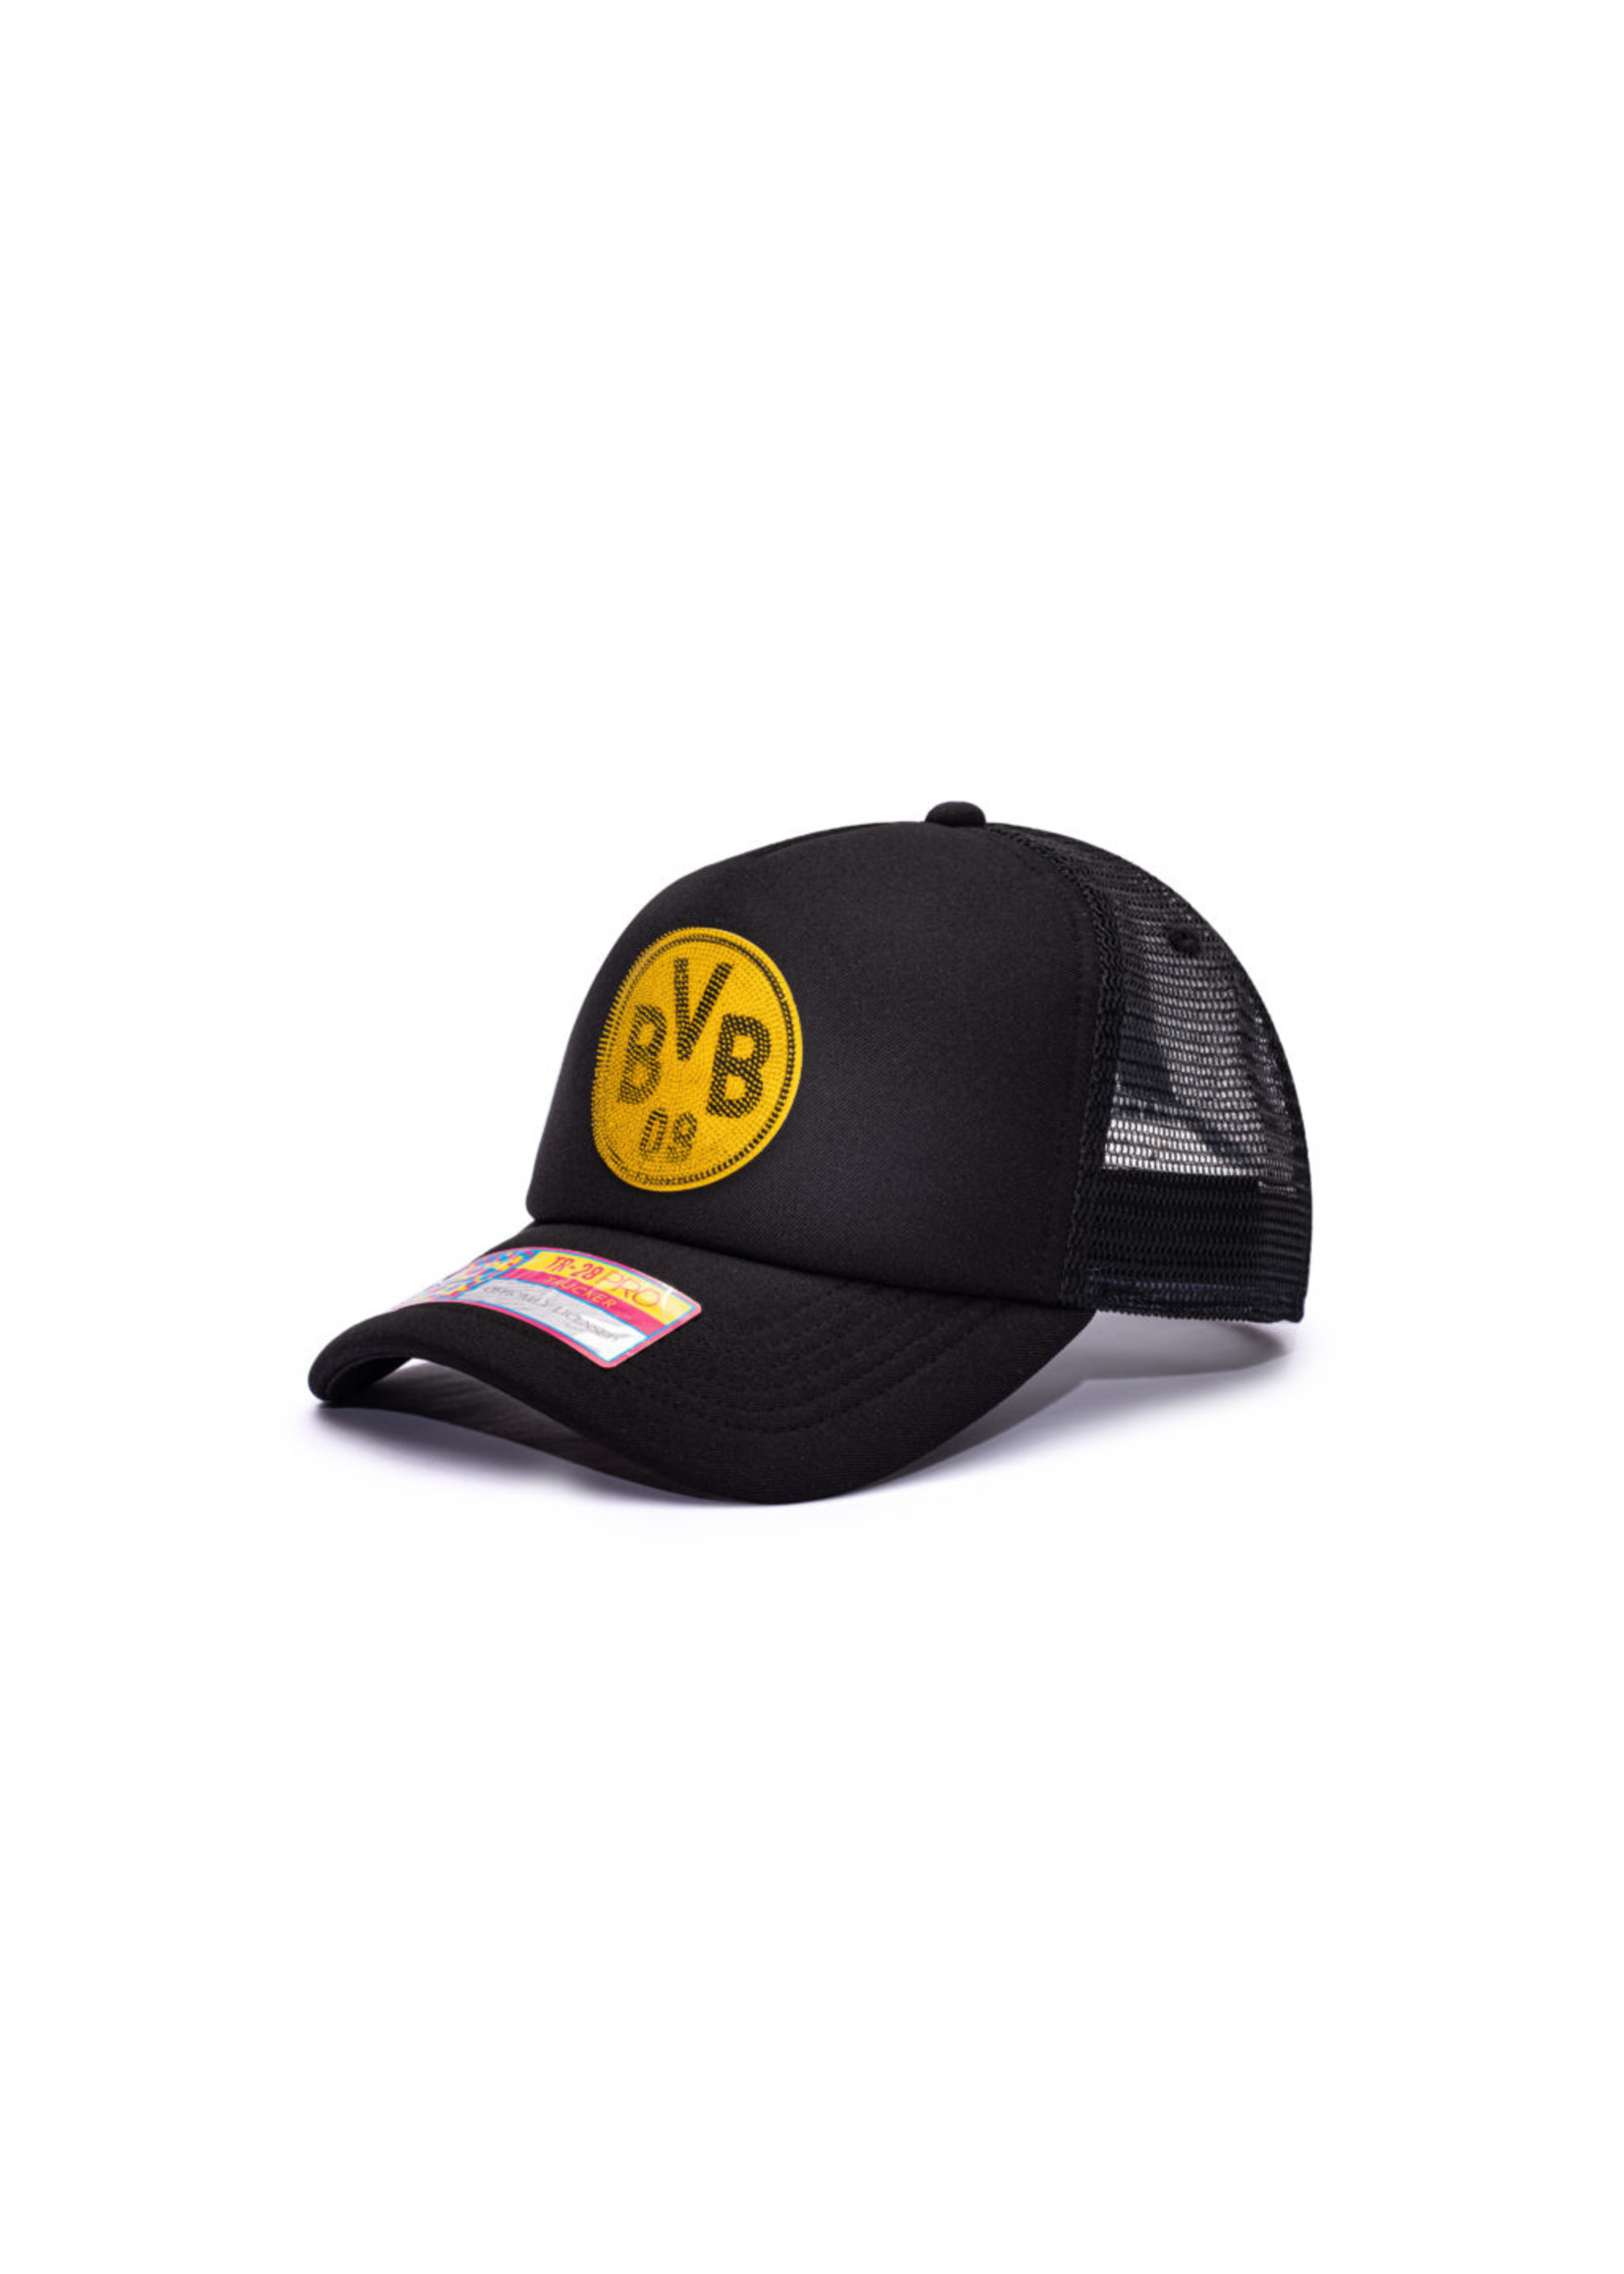 Borussia Dortmund Shield Trucker Snapback Hat